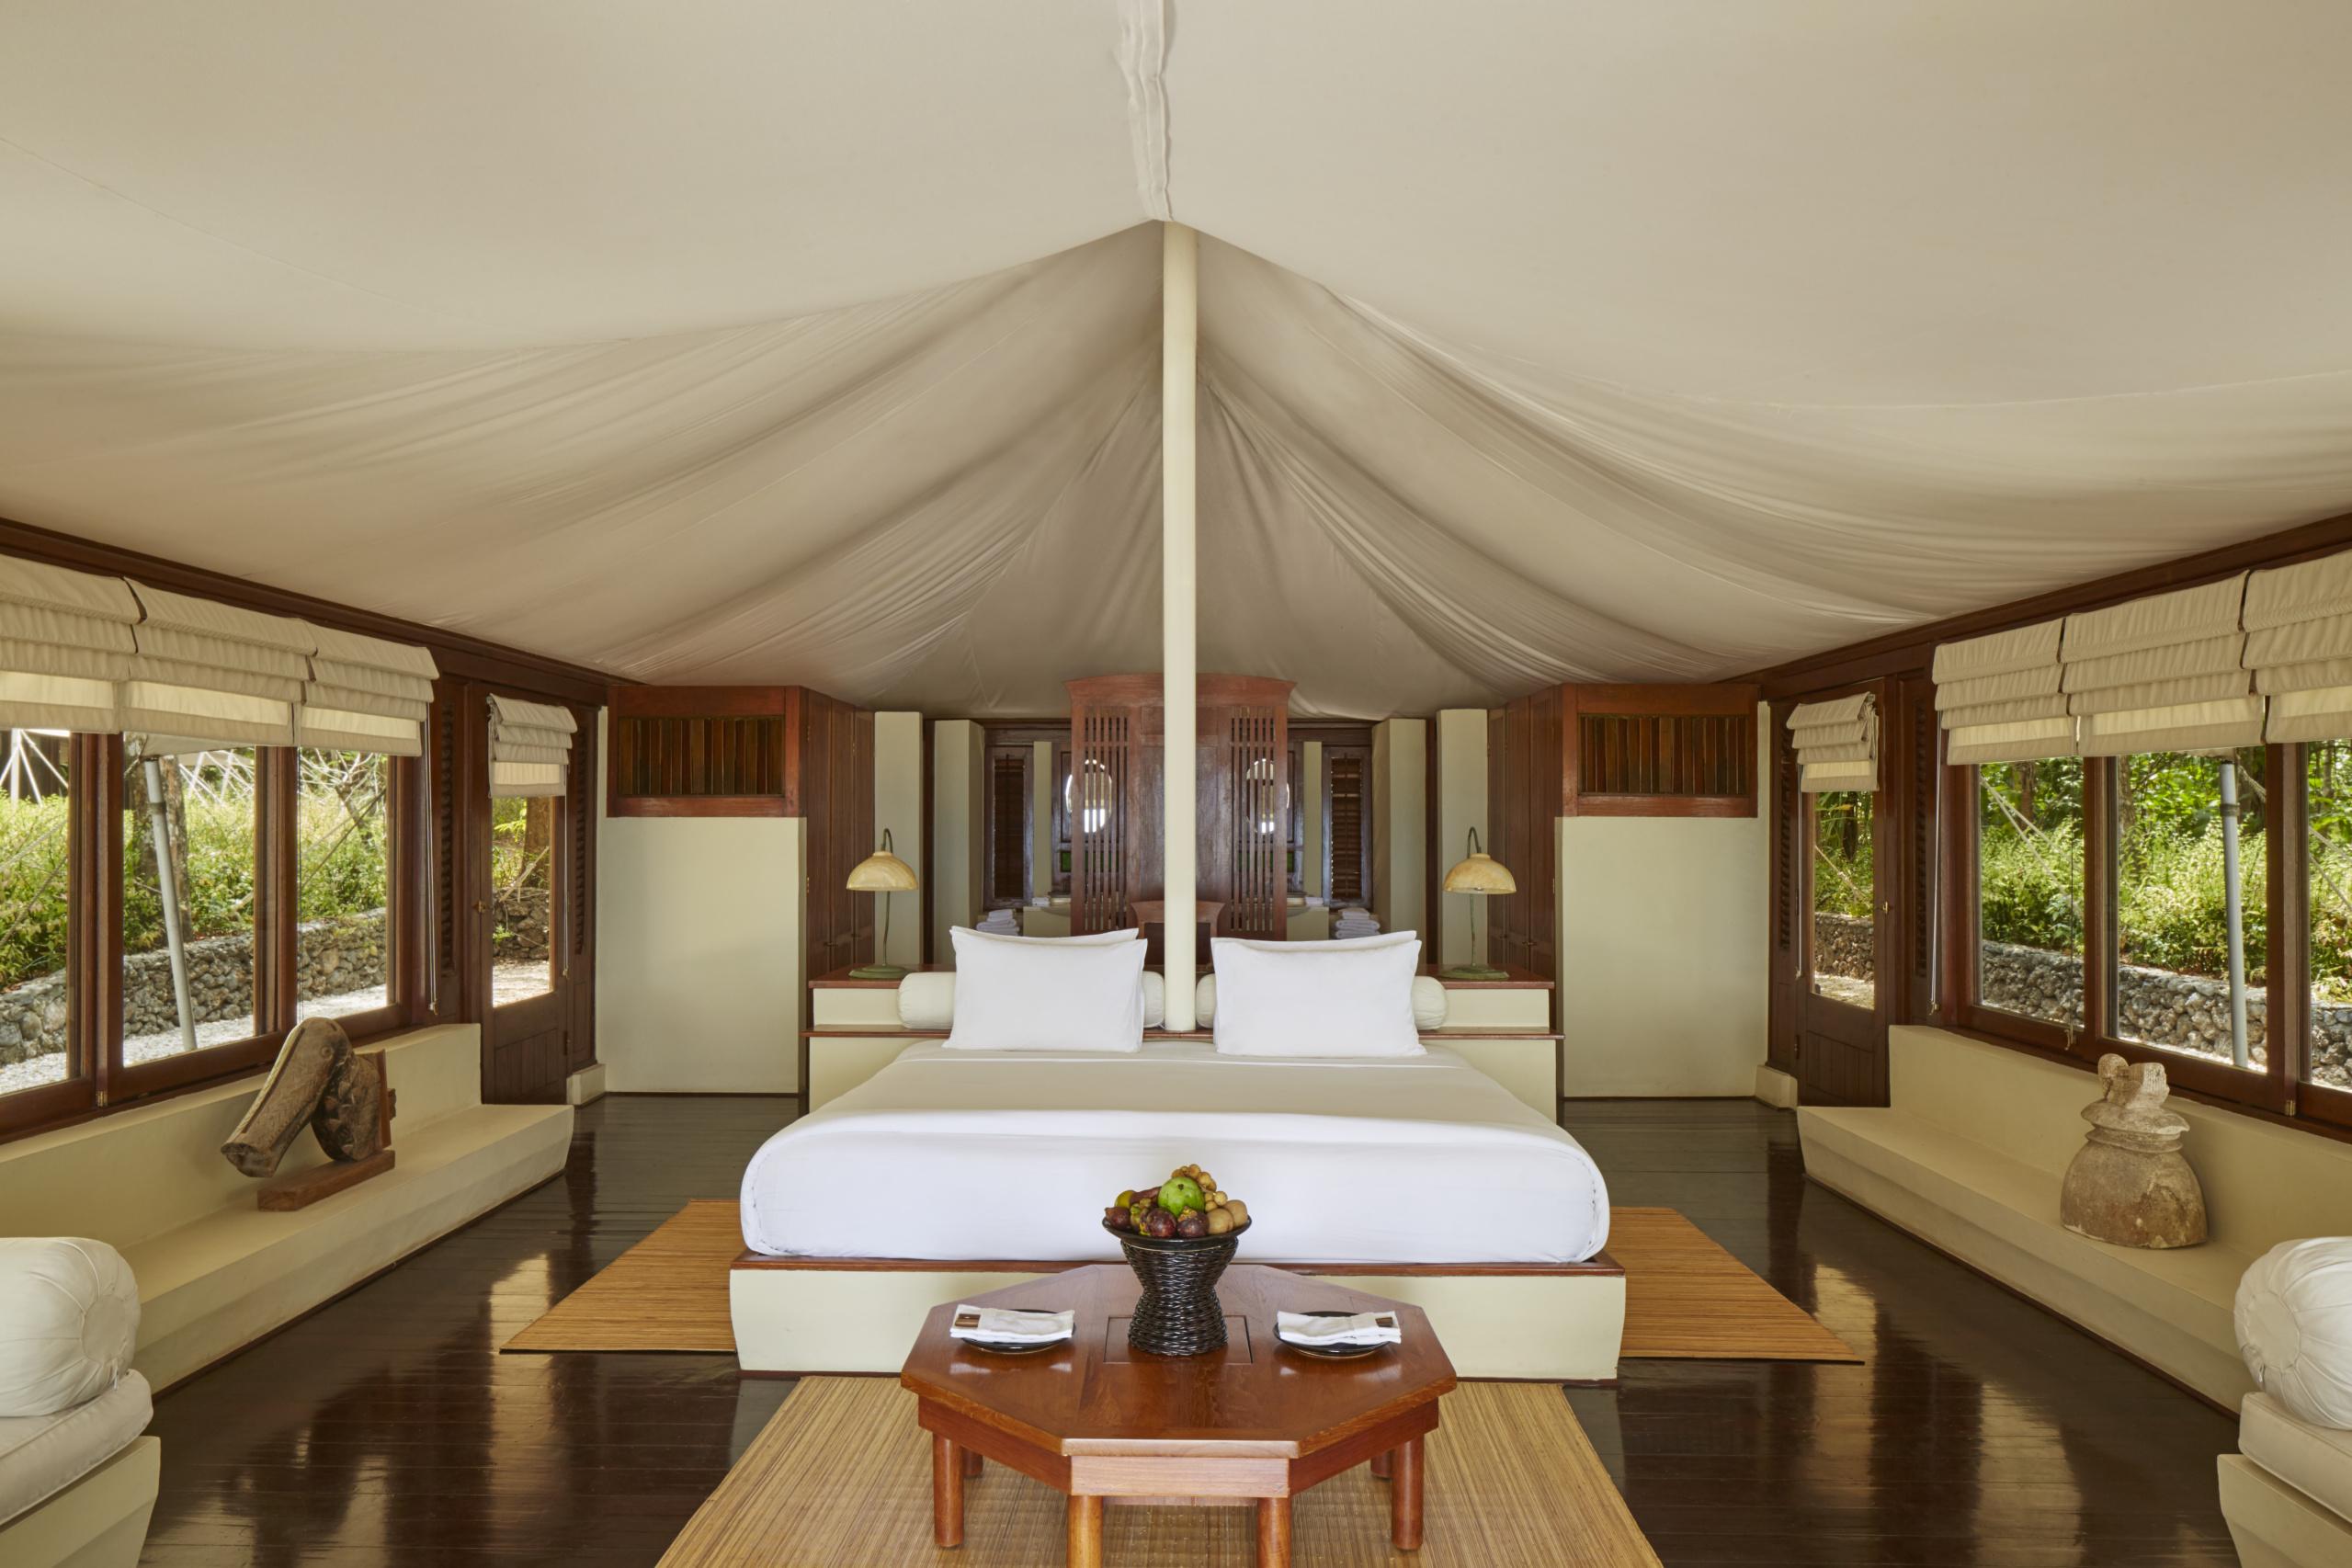 amanwana-moyo-island-tent-interior